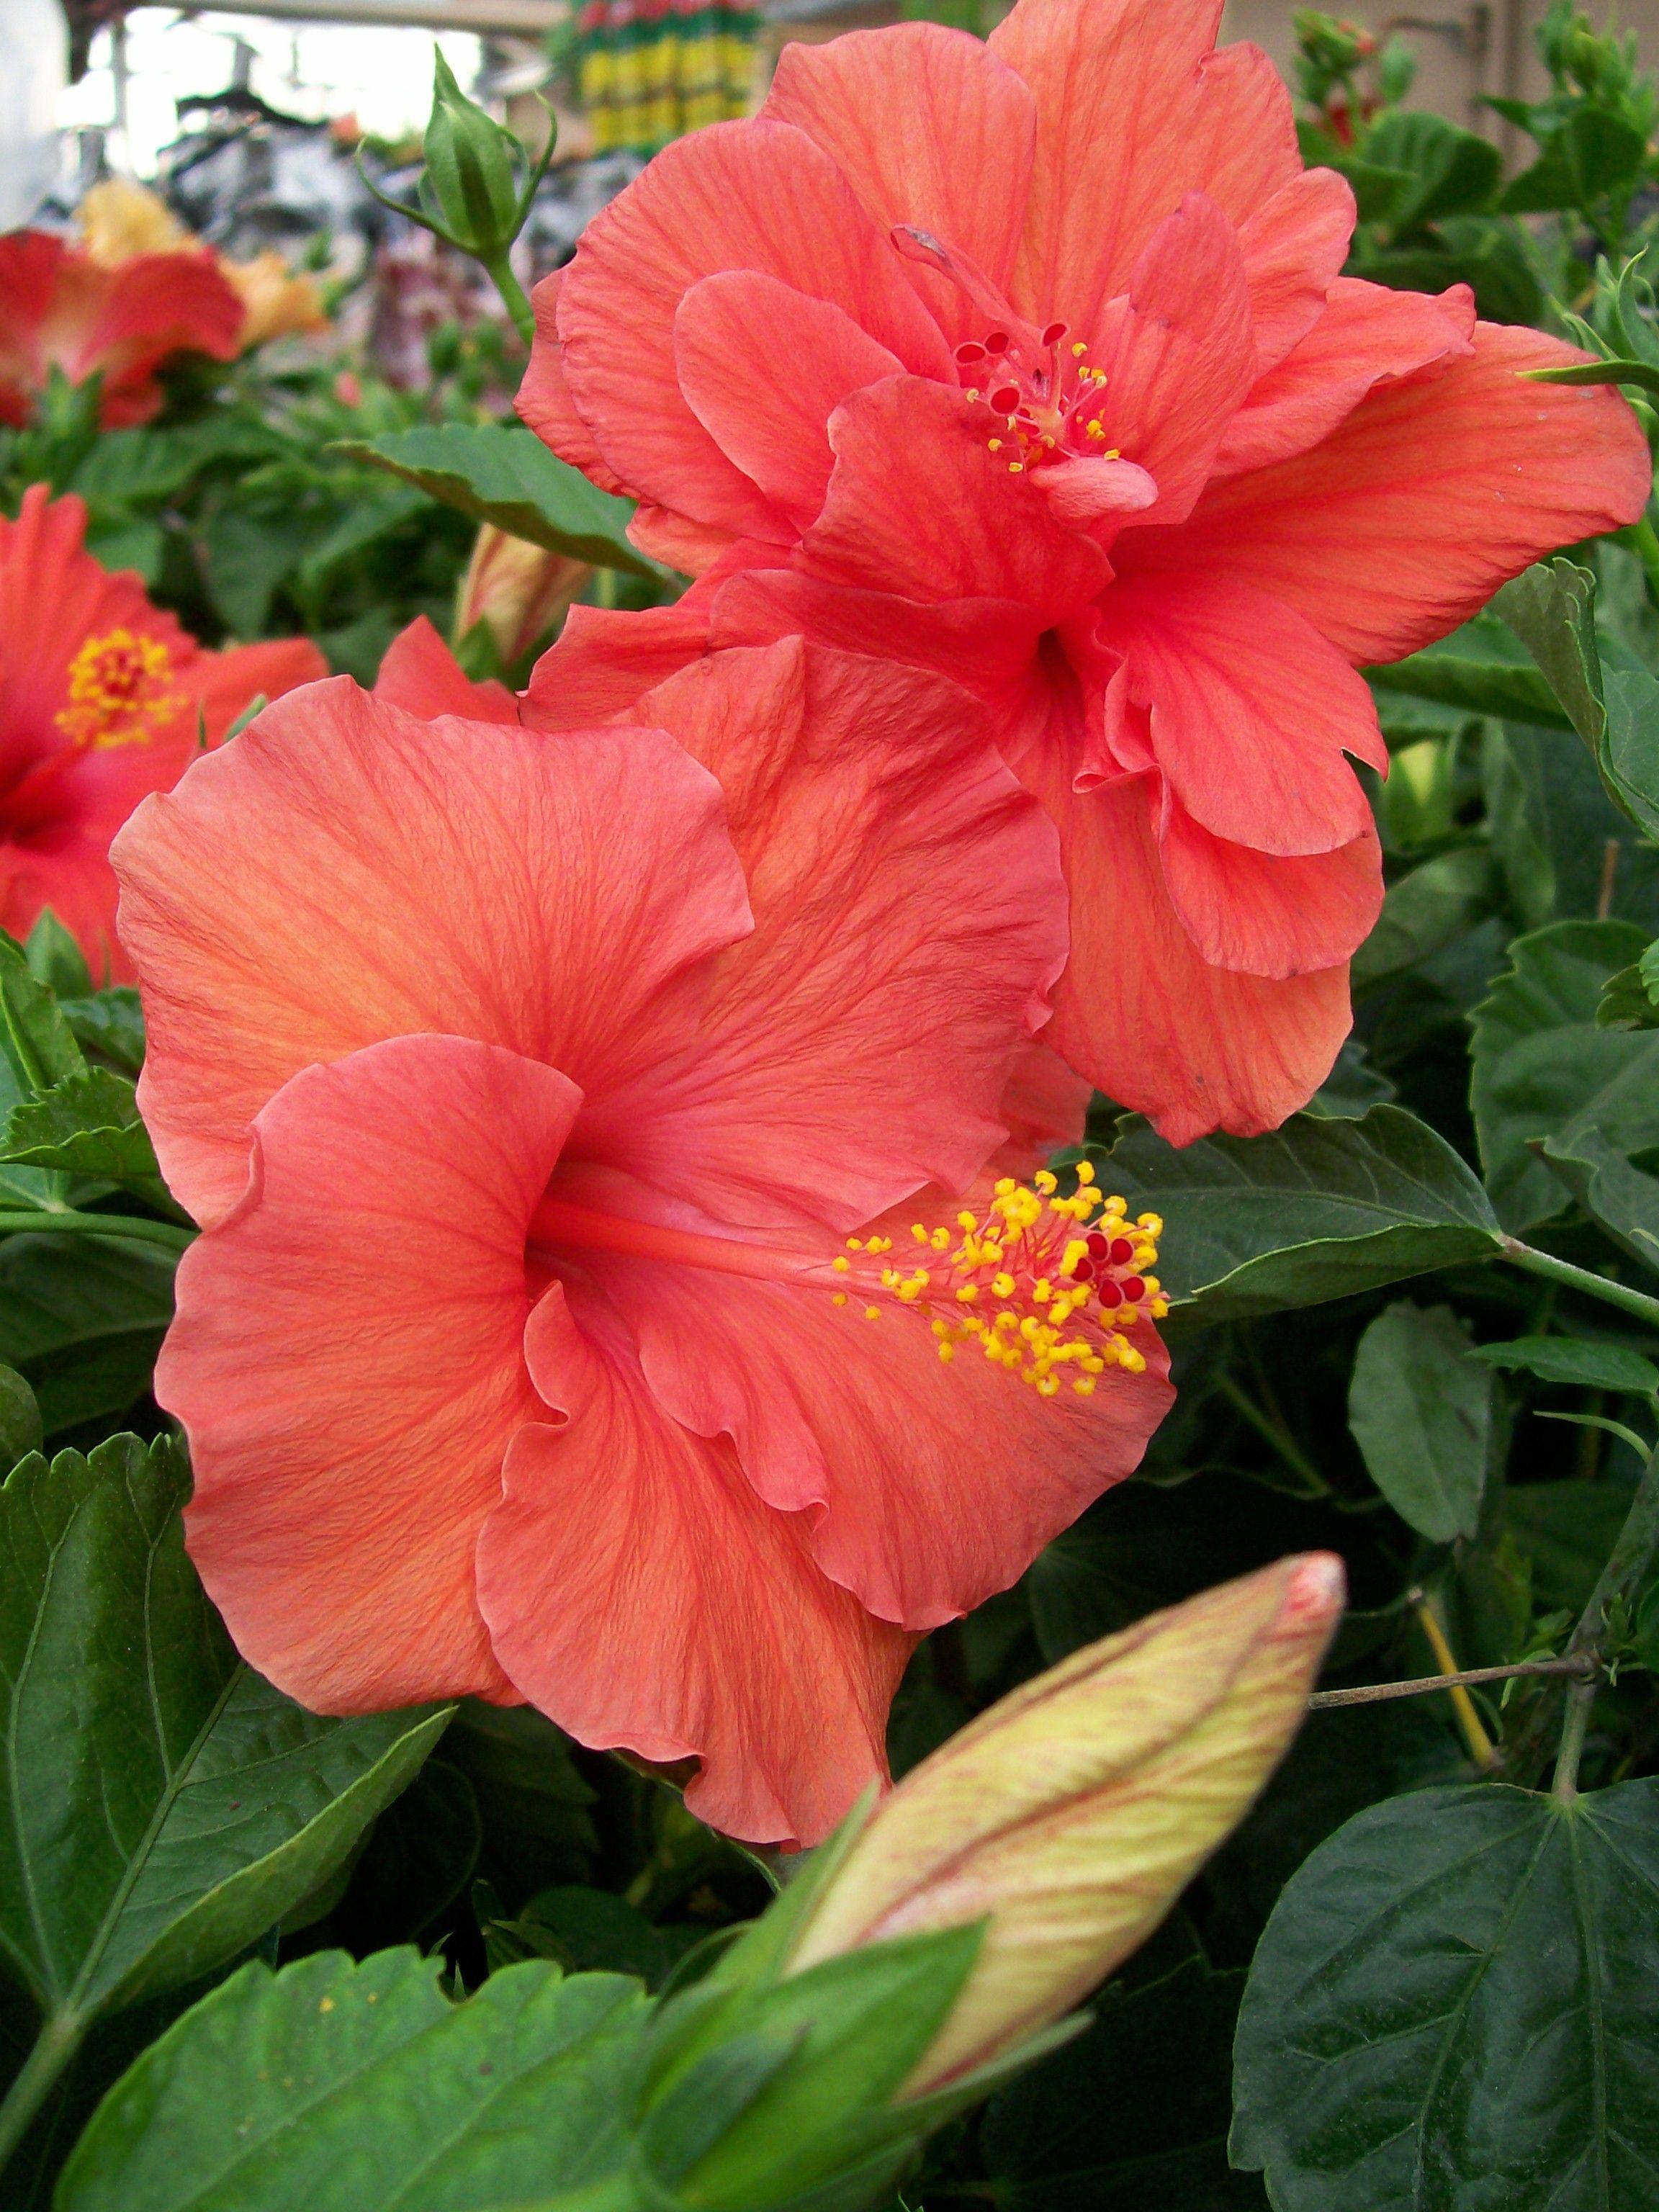 Hibiscus Blooms I Love Blooms Pinterest Hibiscus